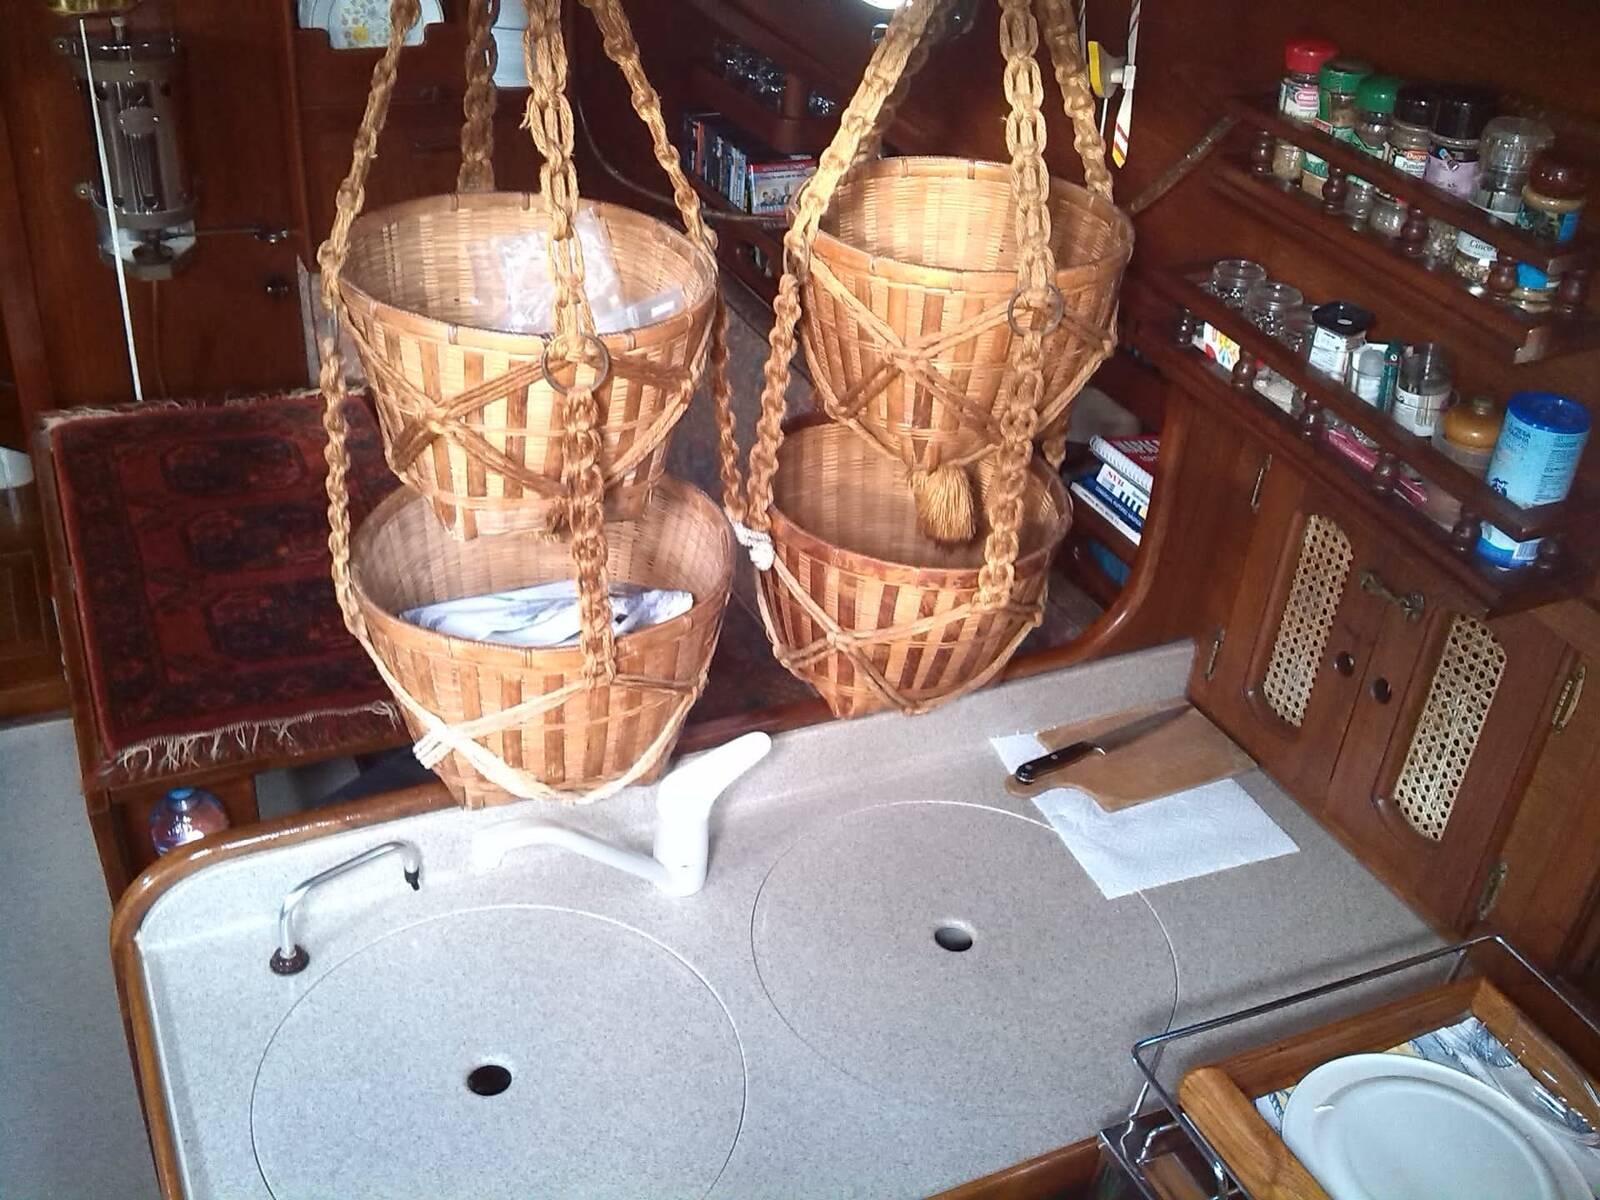 Alajuela 38 Sailing boat long keel boat baskets